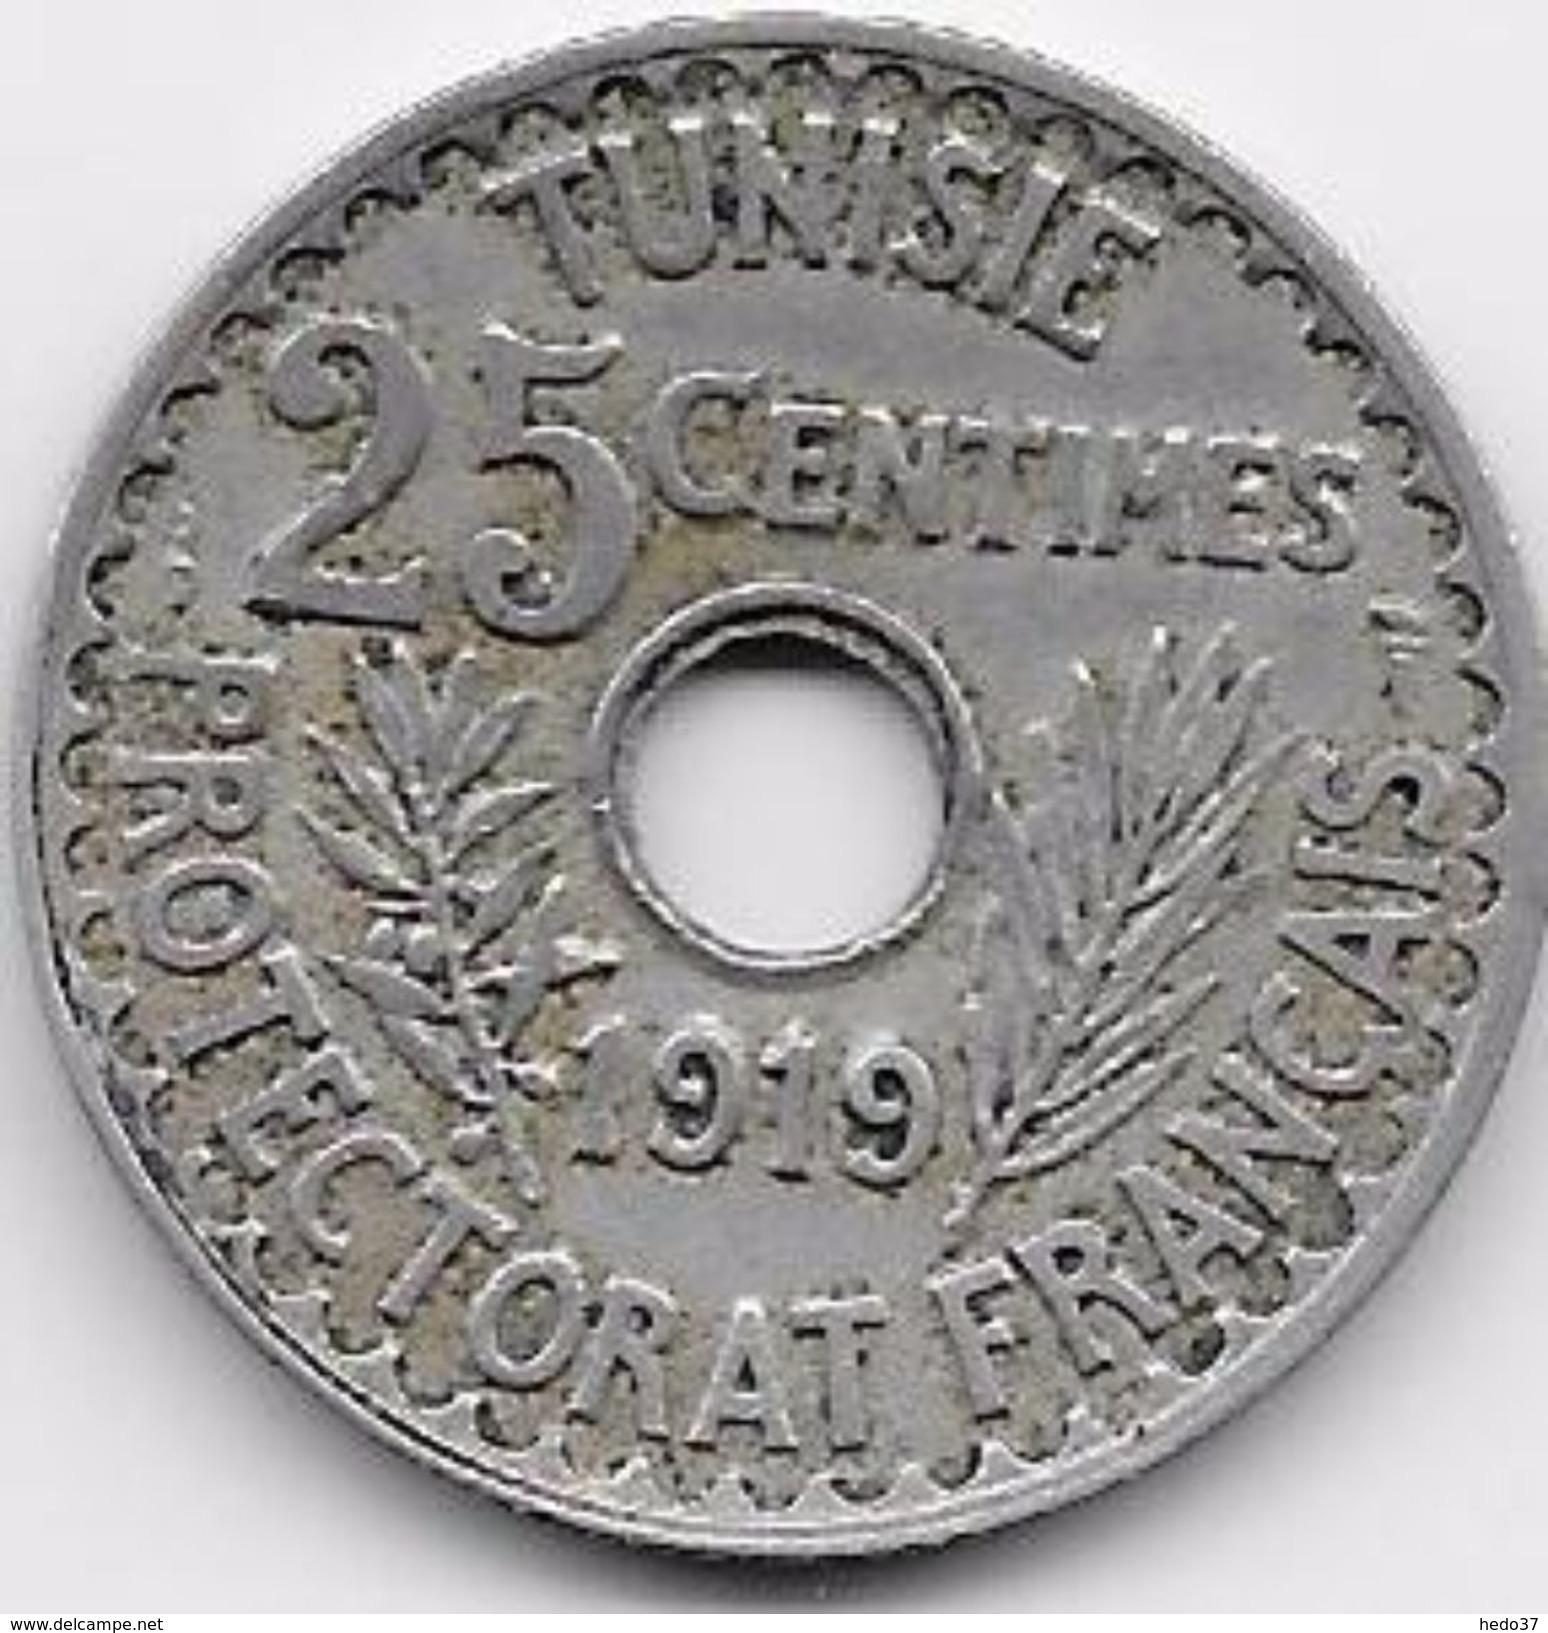 Tunisie 25 Centimes 1919 - Monnaies